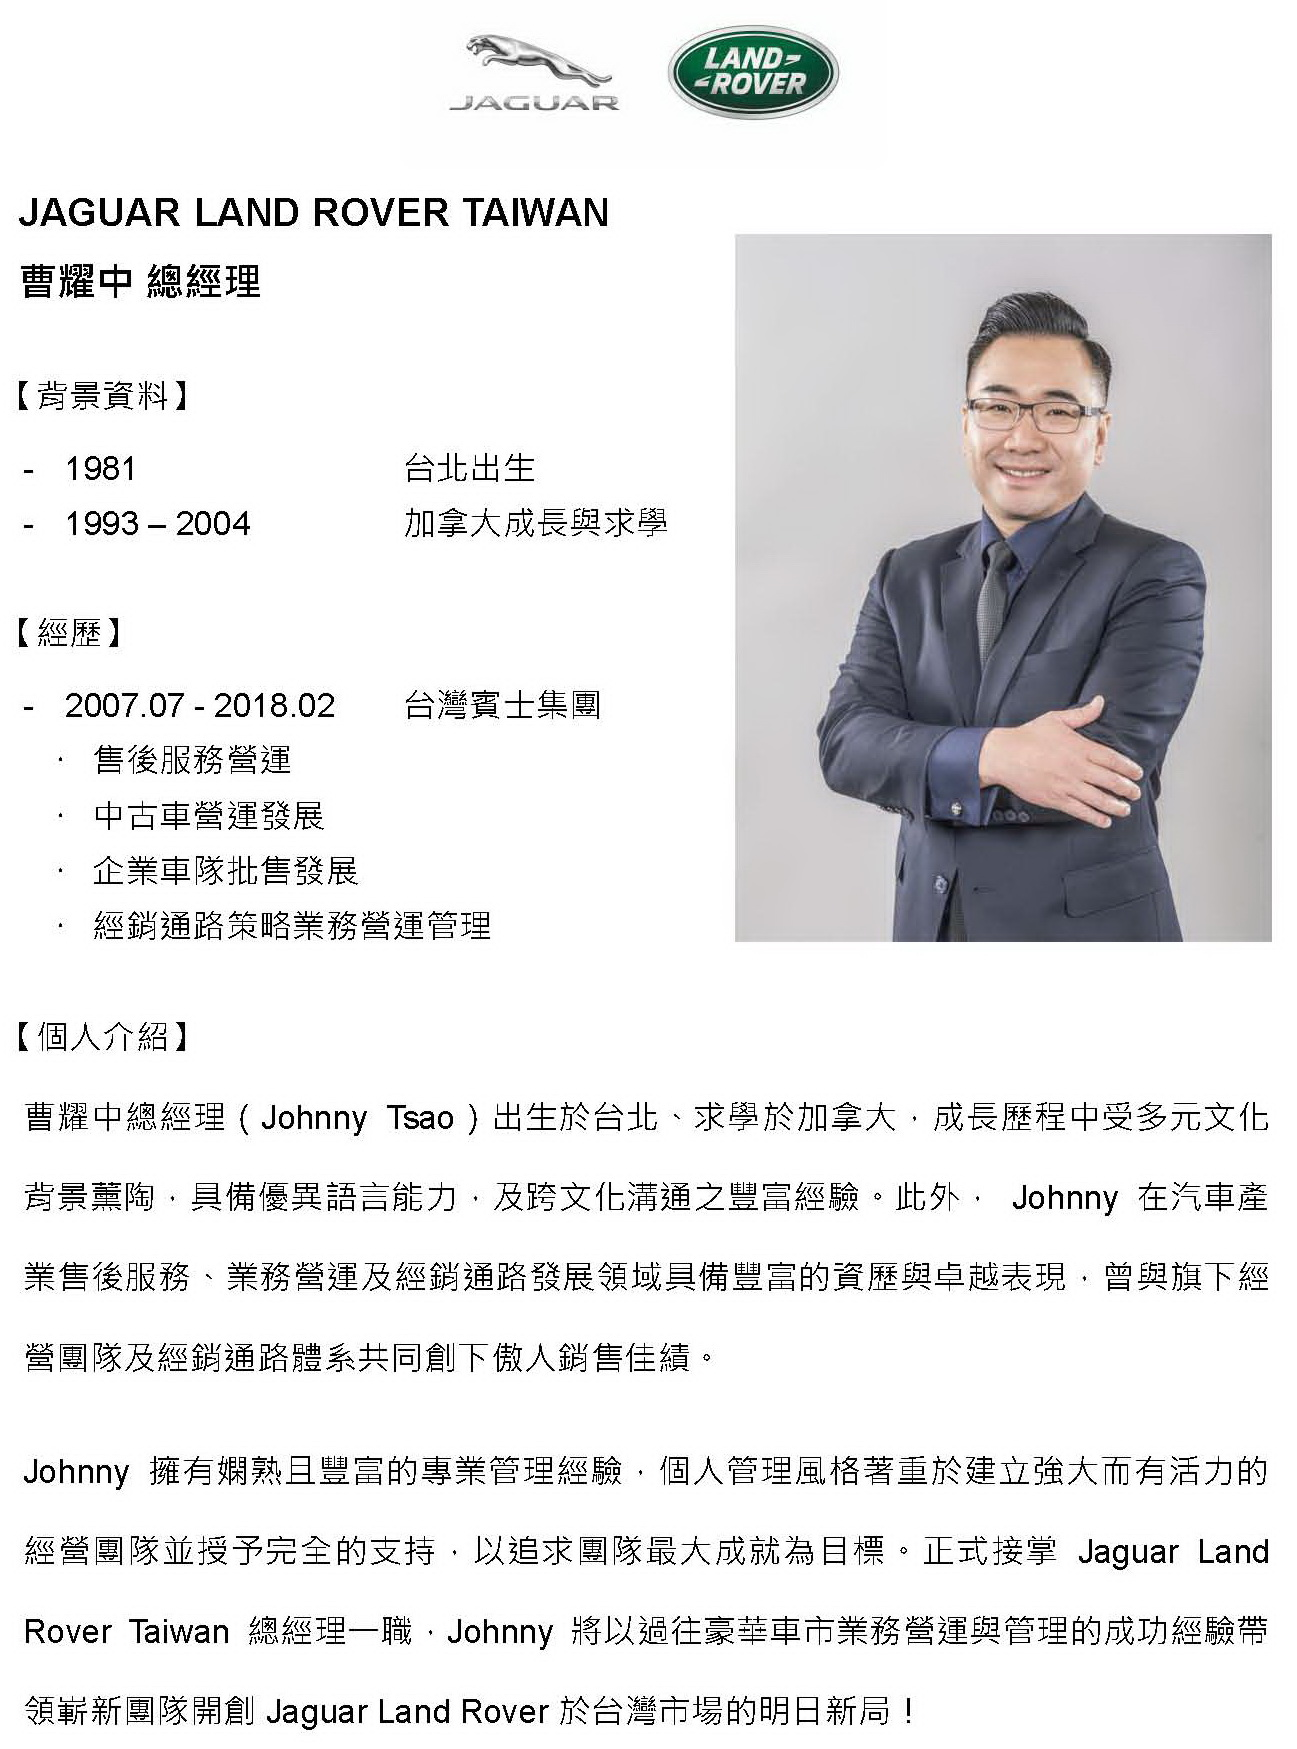 【JAGUAR LAND ROVER TAIWAN 媒體資料】 曹耀中總經理簡介